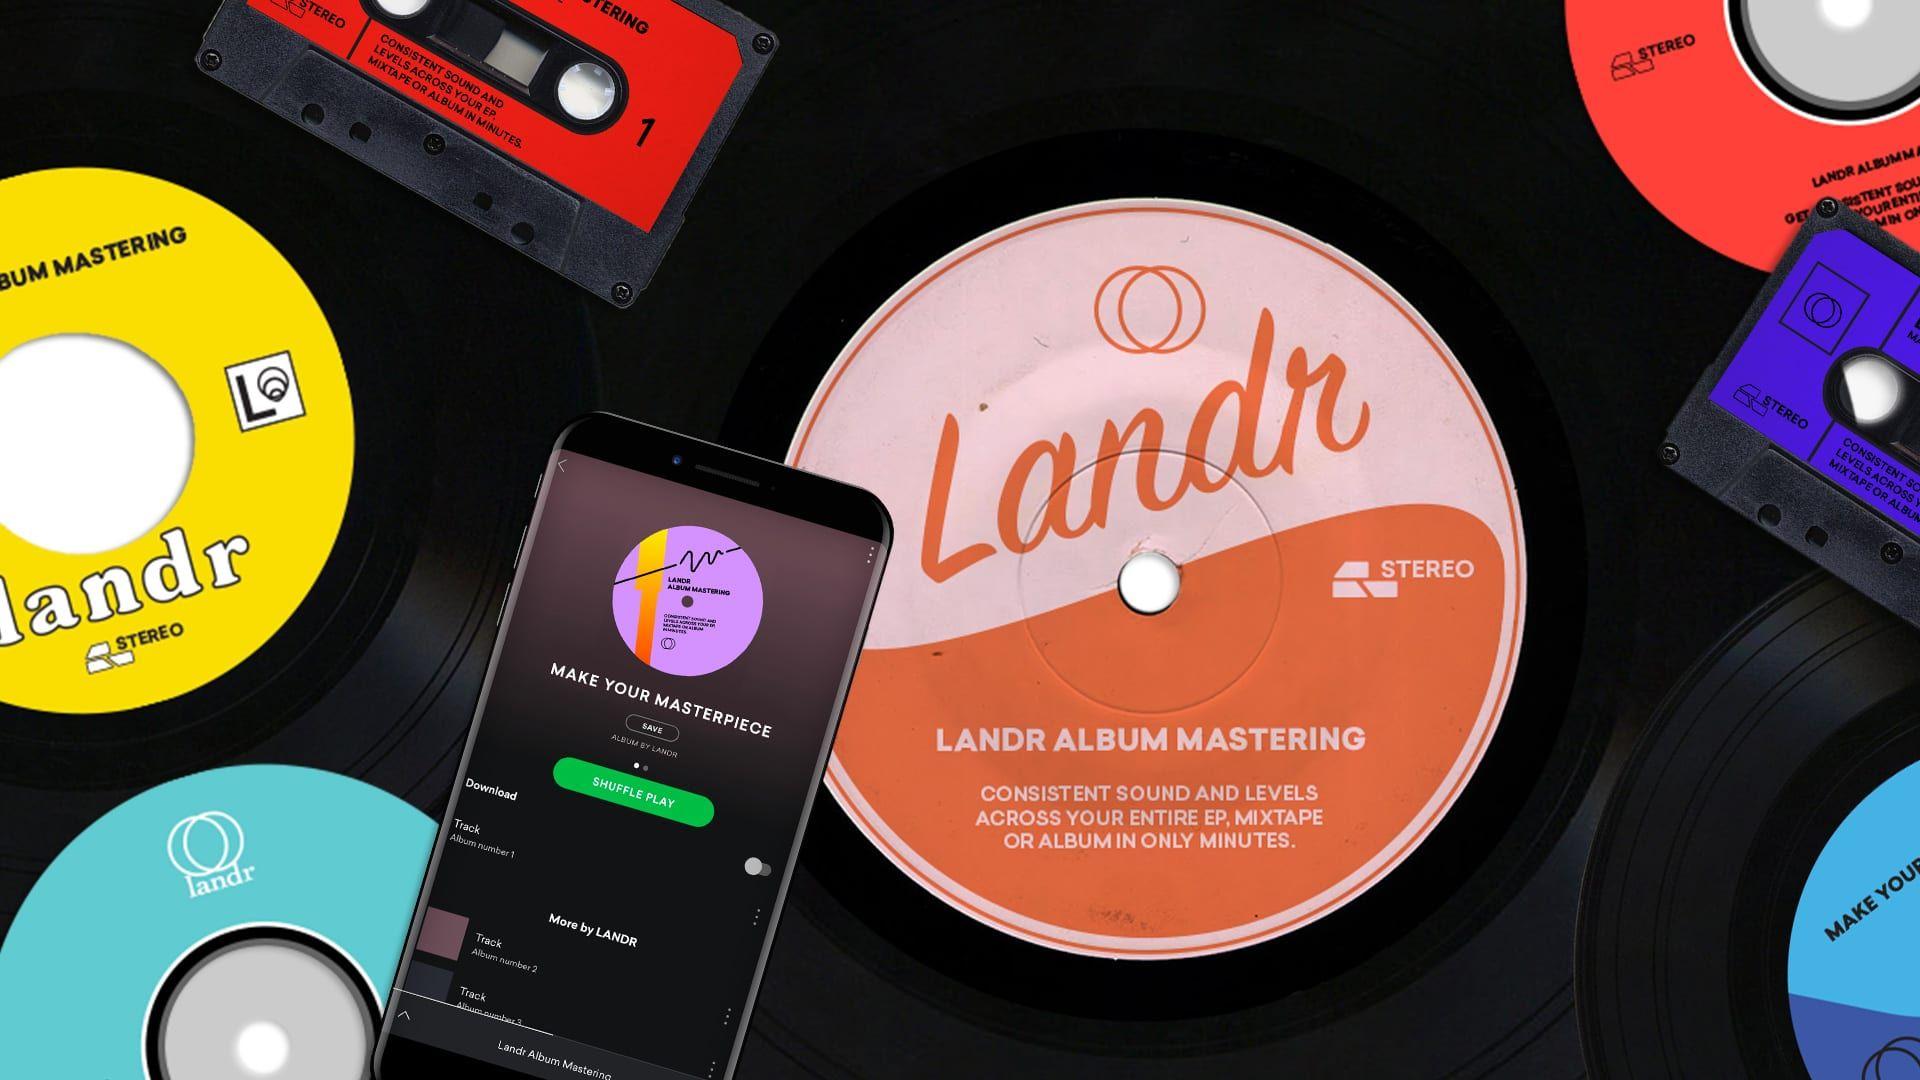 landr_album_mastering_1920x1080.jpg